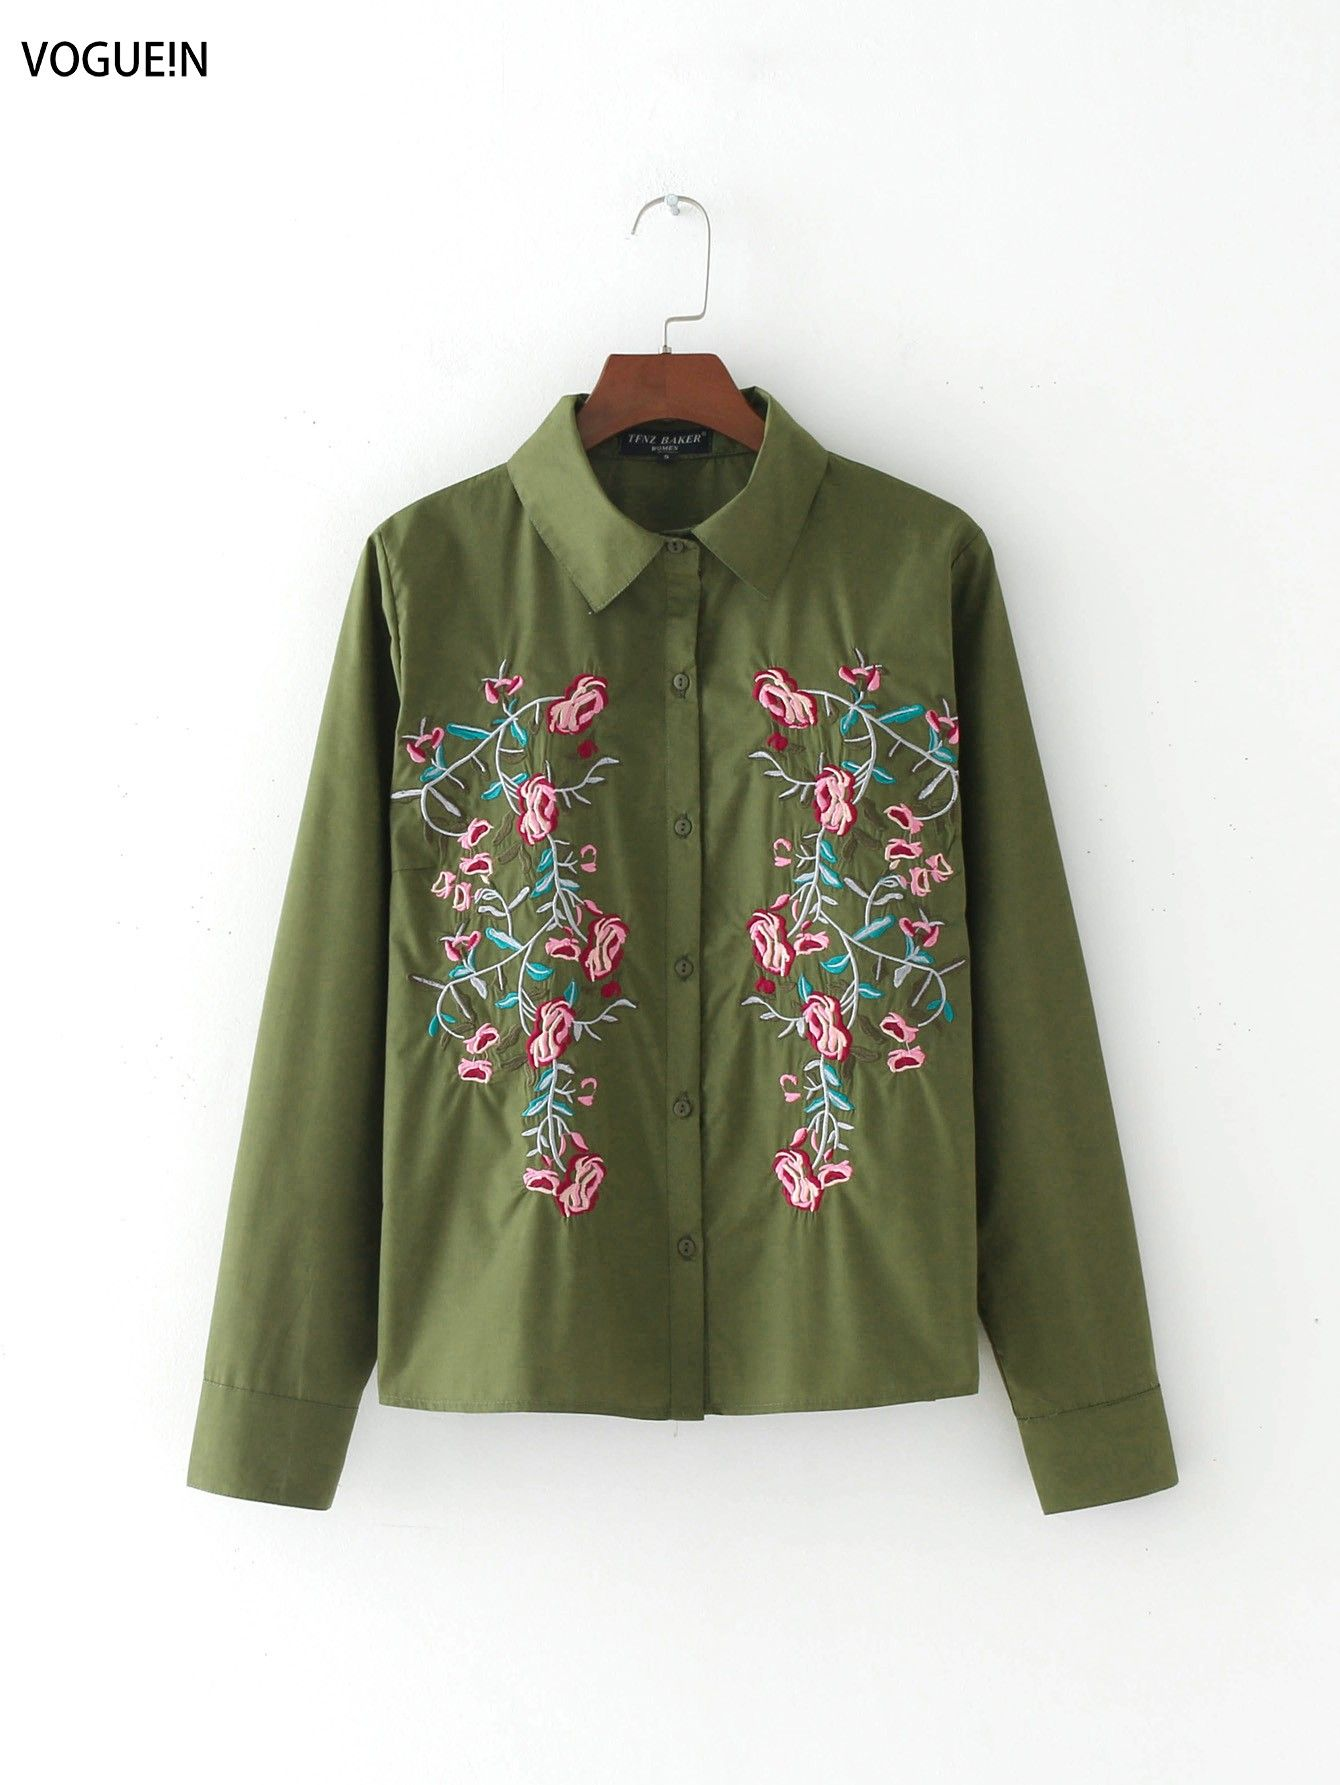 2018 V Neck Flower Print Lacing Up Waist Kimono Shirt Holiday New Women Laminated Lantern Sleeve Beach Bow Tie Short Blouse Tops Blouses & Shirts